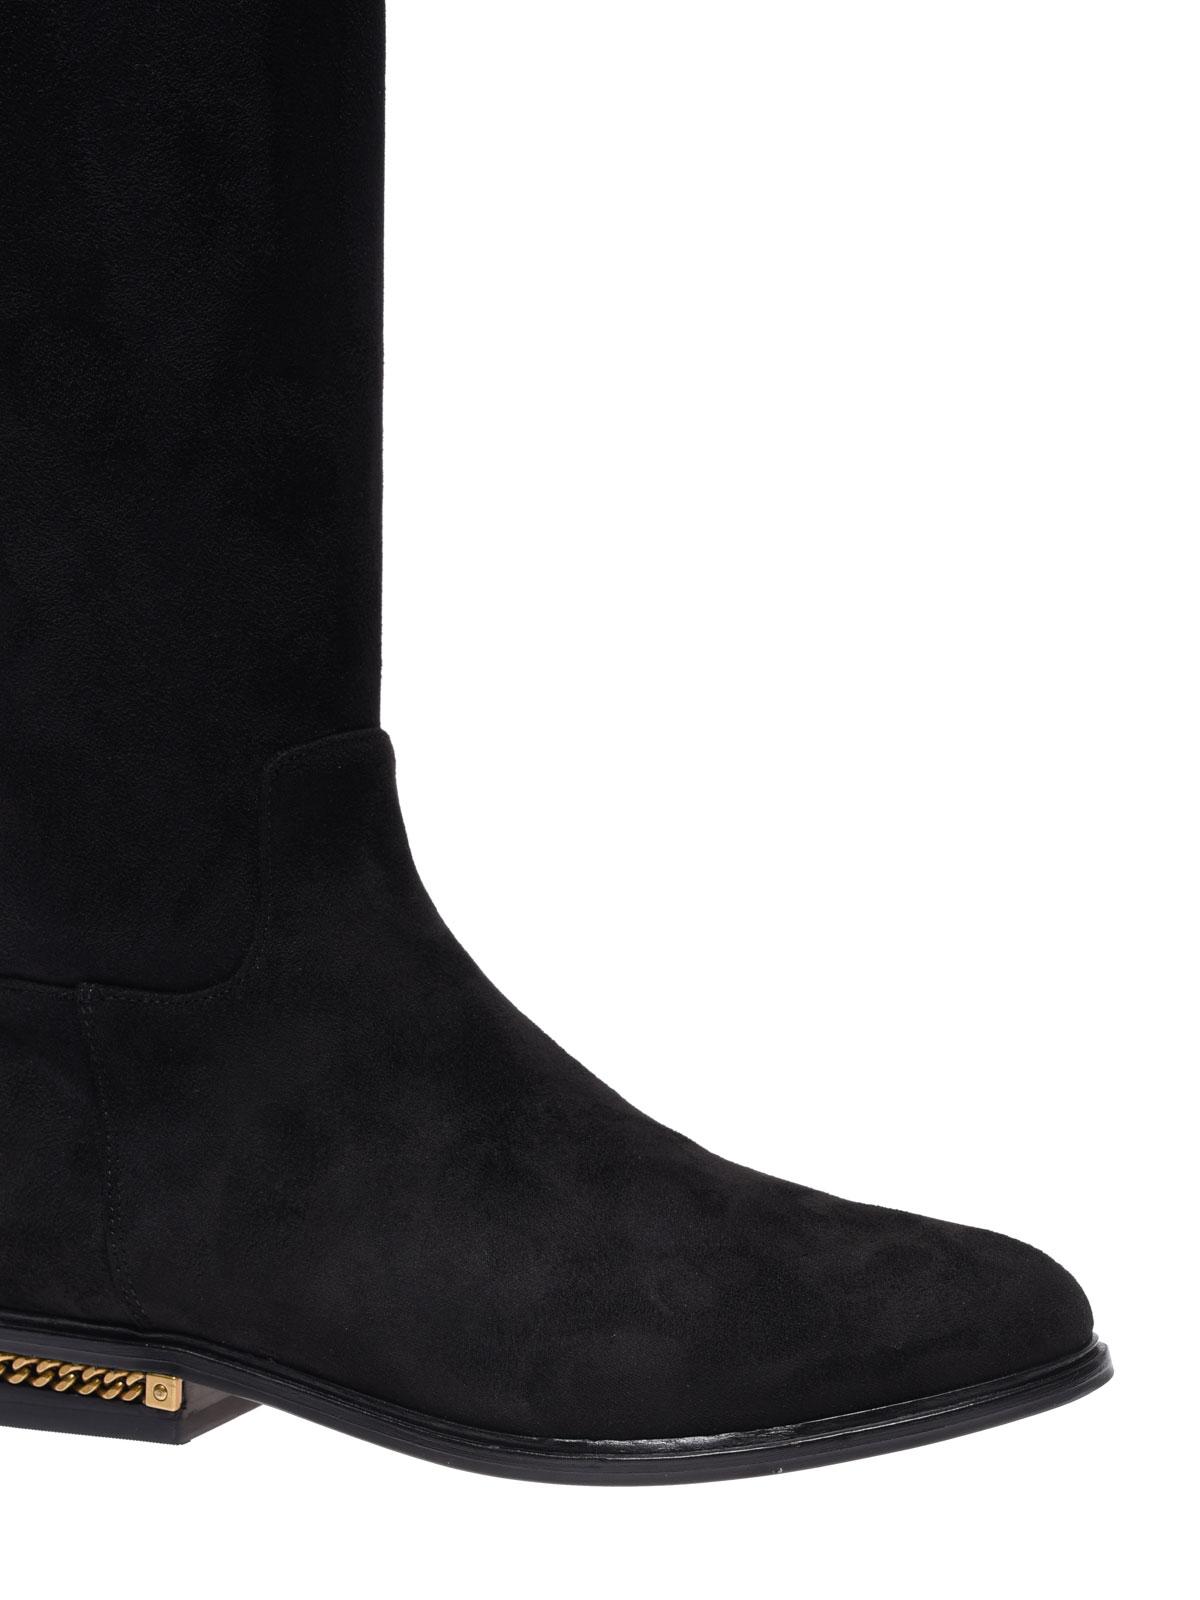 46ab5f782c4 Michael Kors - Jamie stretch suede boots - boots - 40F8JMFB5S 001